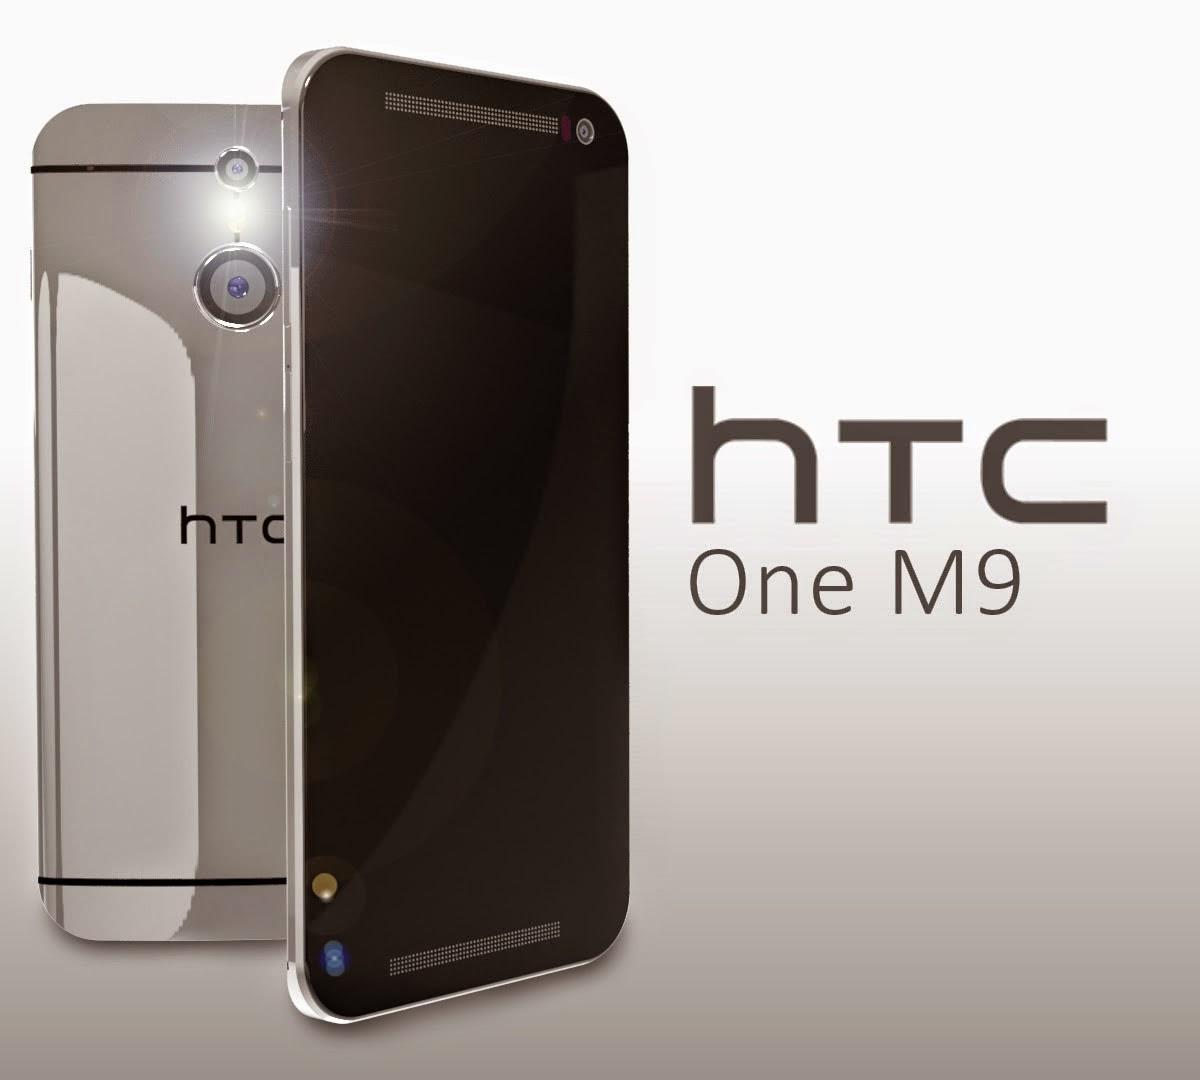 HTC-Hima-Ace-Plus-Specs-5-5-Inch-QHD-Display-Snapdragon-810-Fingerprint-Scanner-469923-3